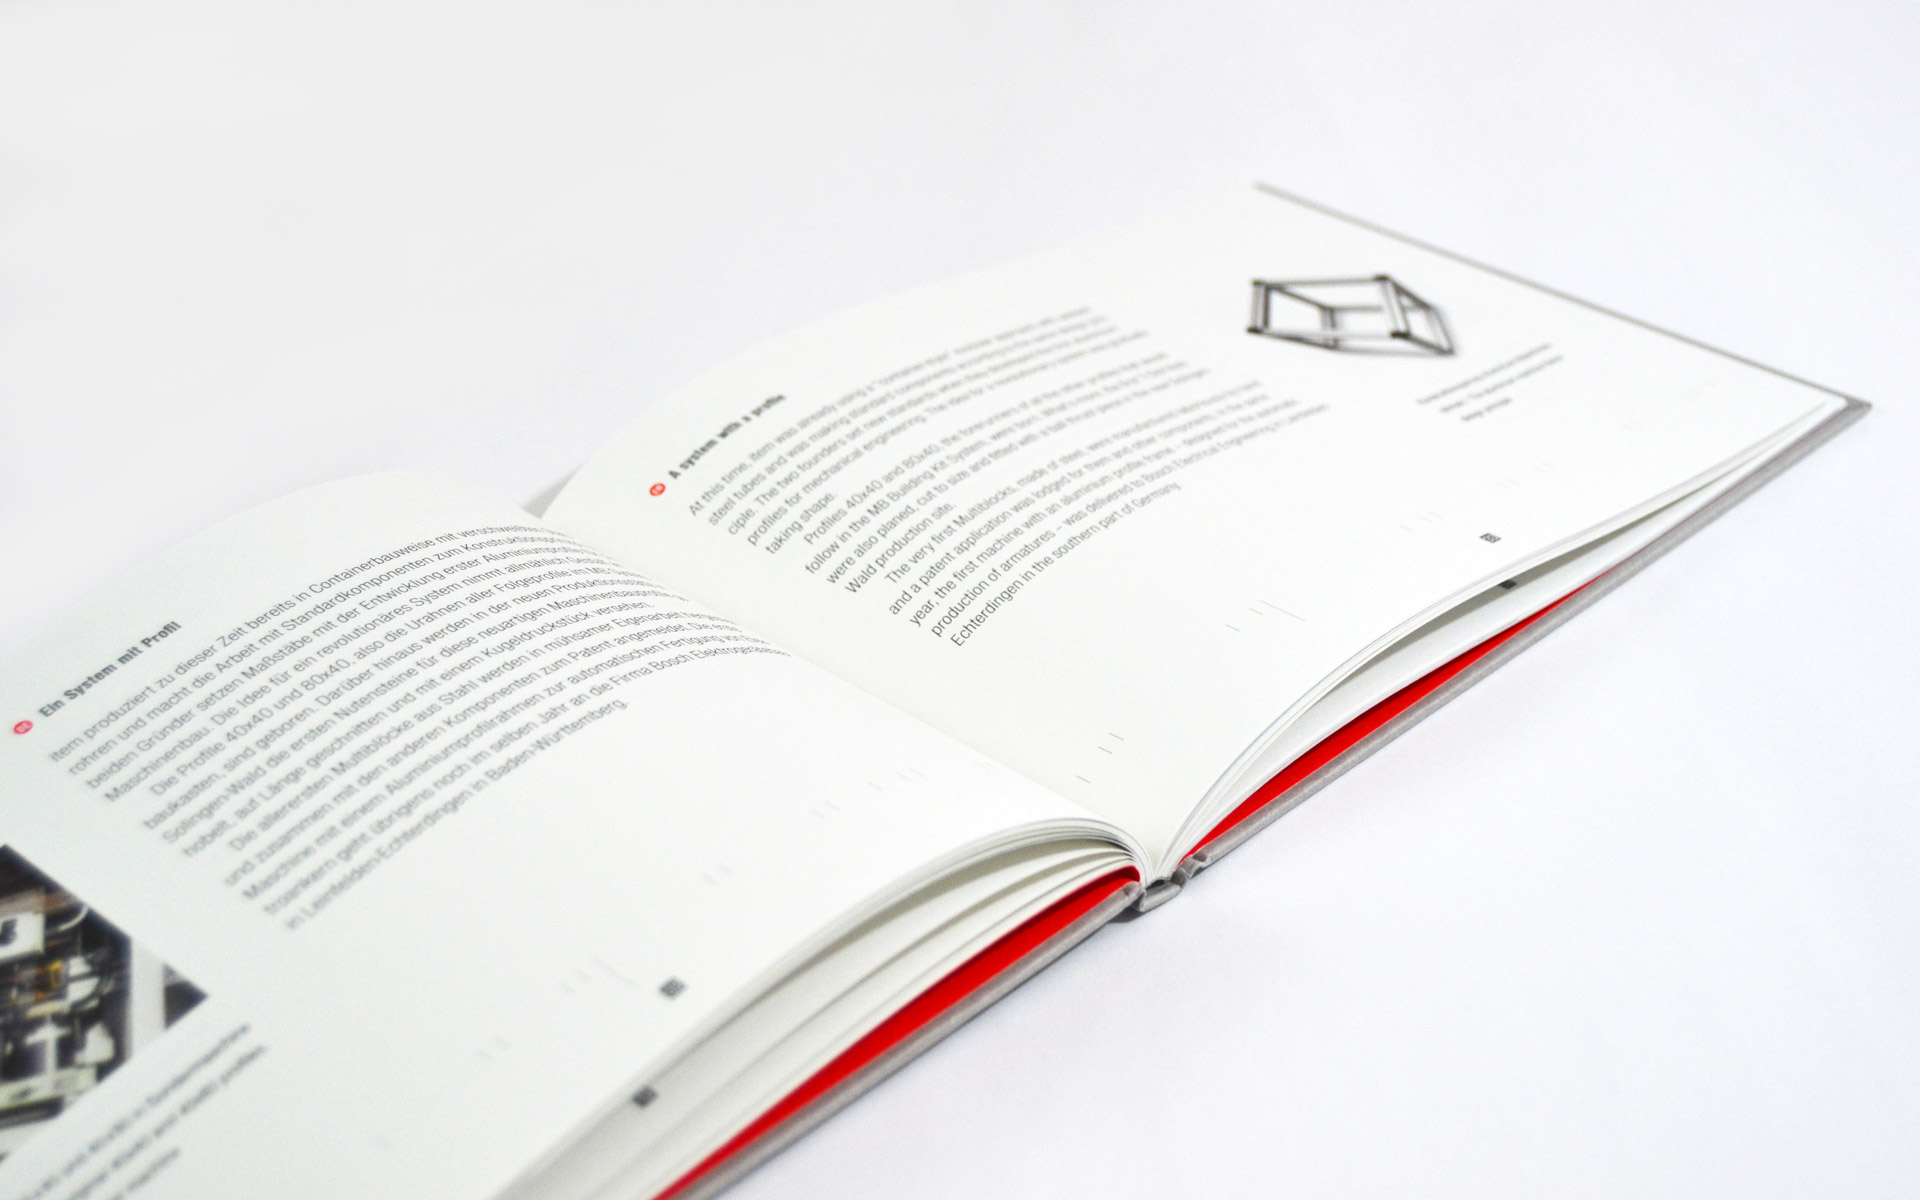 wigge, wisuell, item, Buch